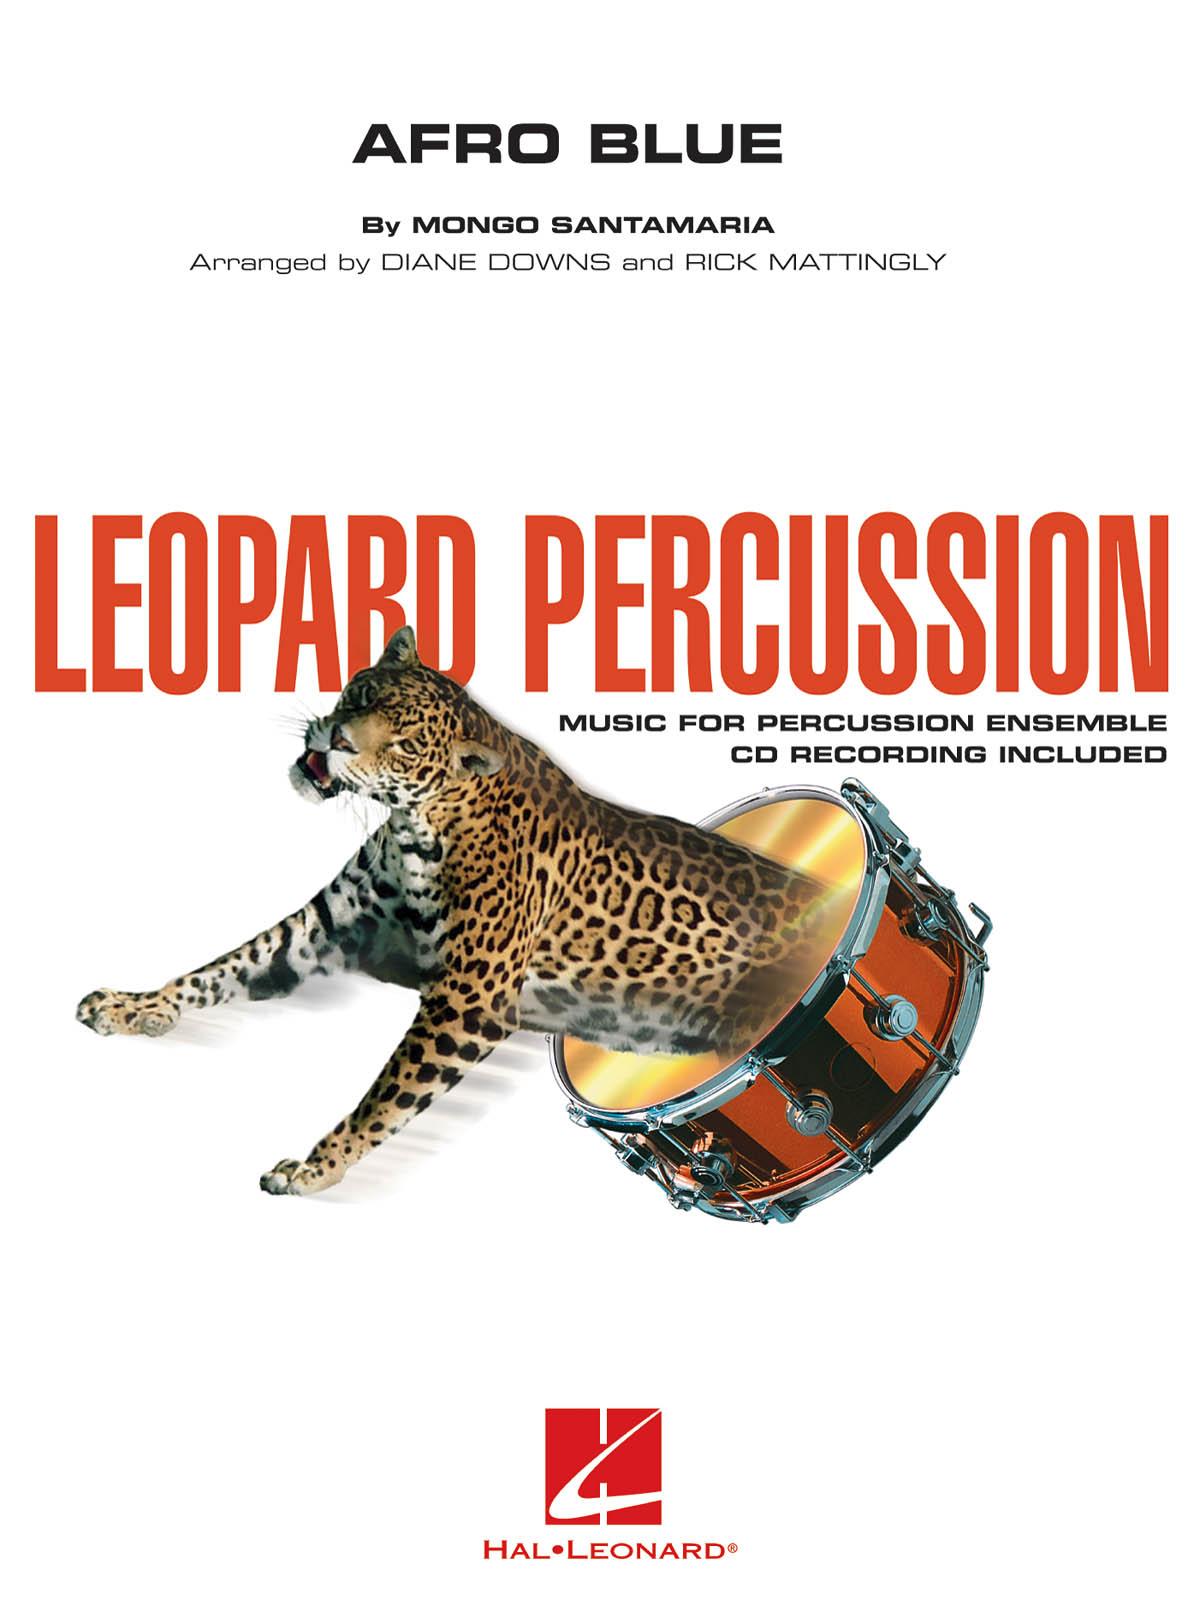 Mongo Santamaria: Afro Blue - Leopard Percussion: Percussion Ensemble: Score